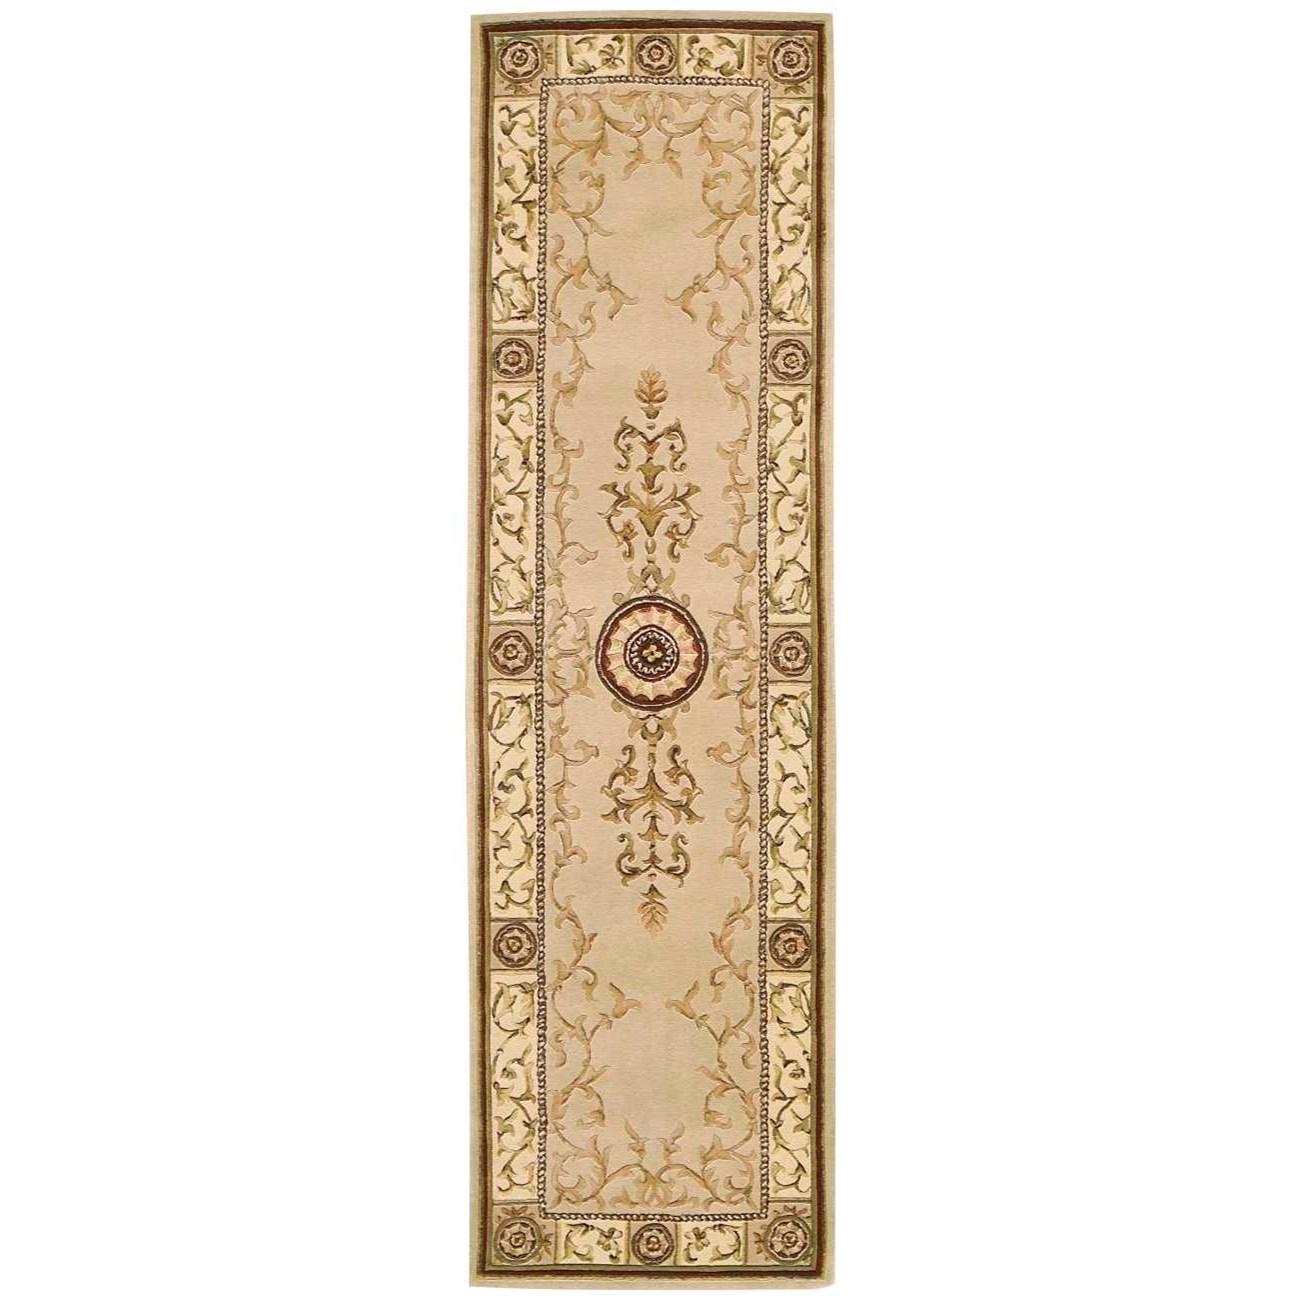 "Nourison Versailles Palace 2'3"" x 8' Beige Runner Rug - Item Number: VP04 BGE 23X8"